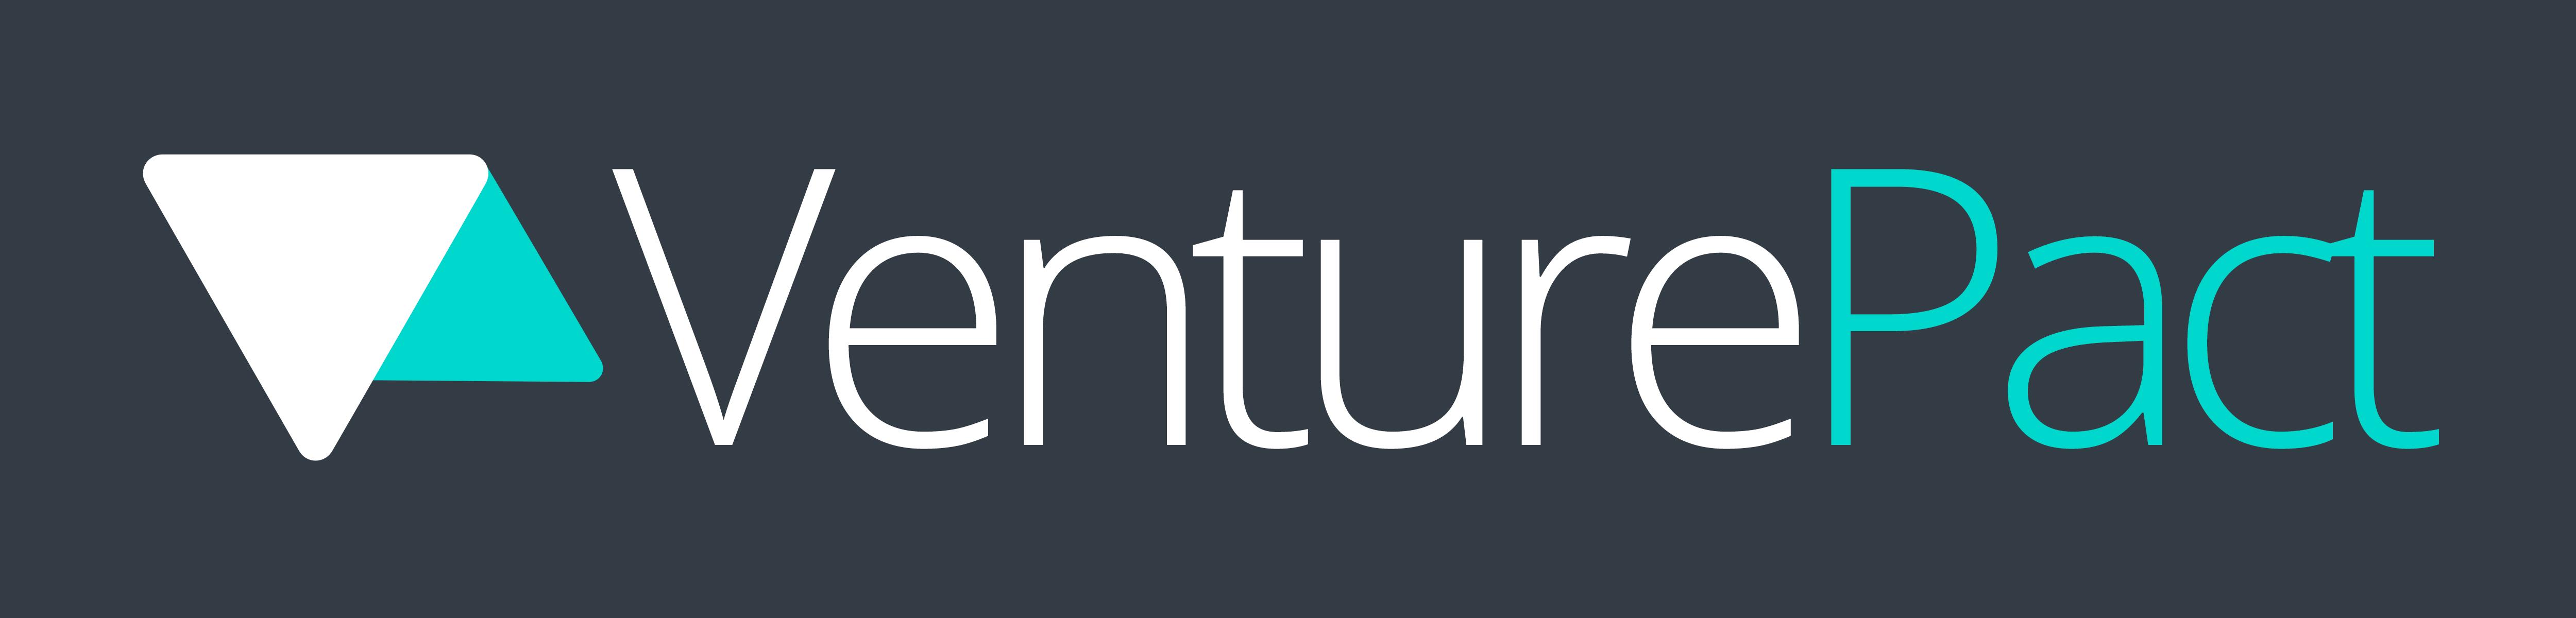 VenturePact-Logo